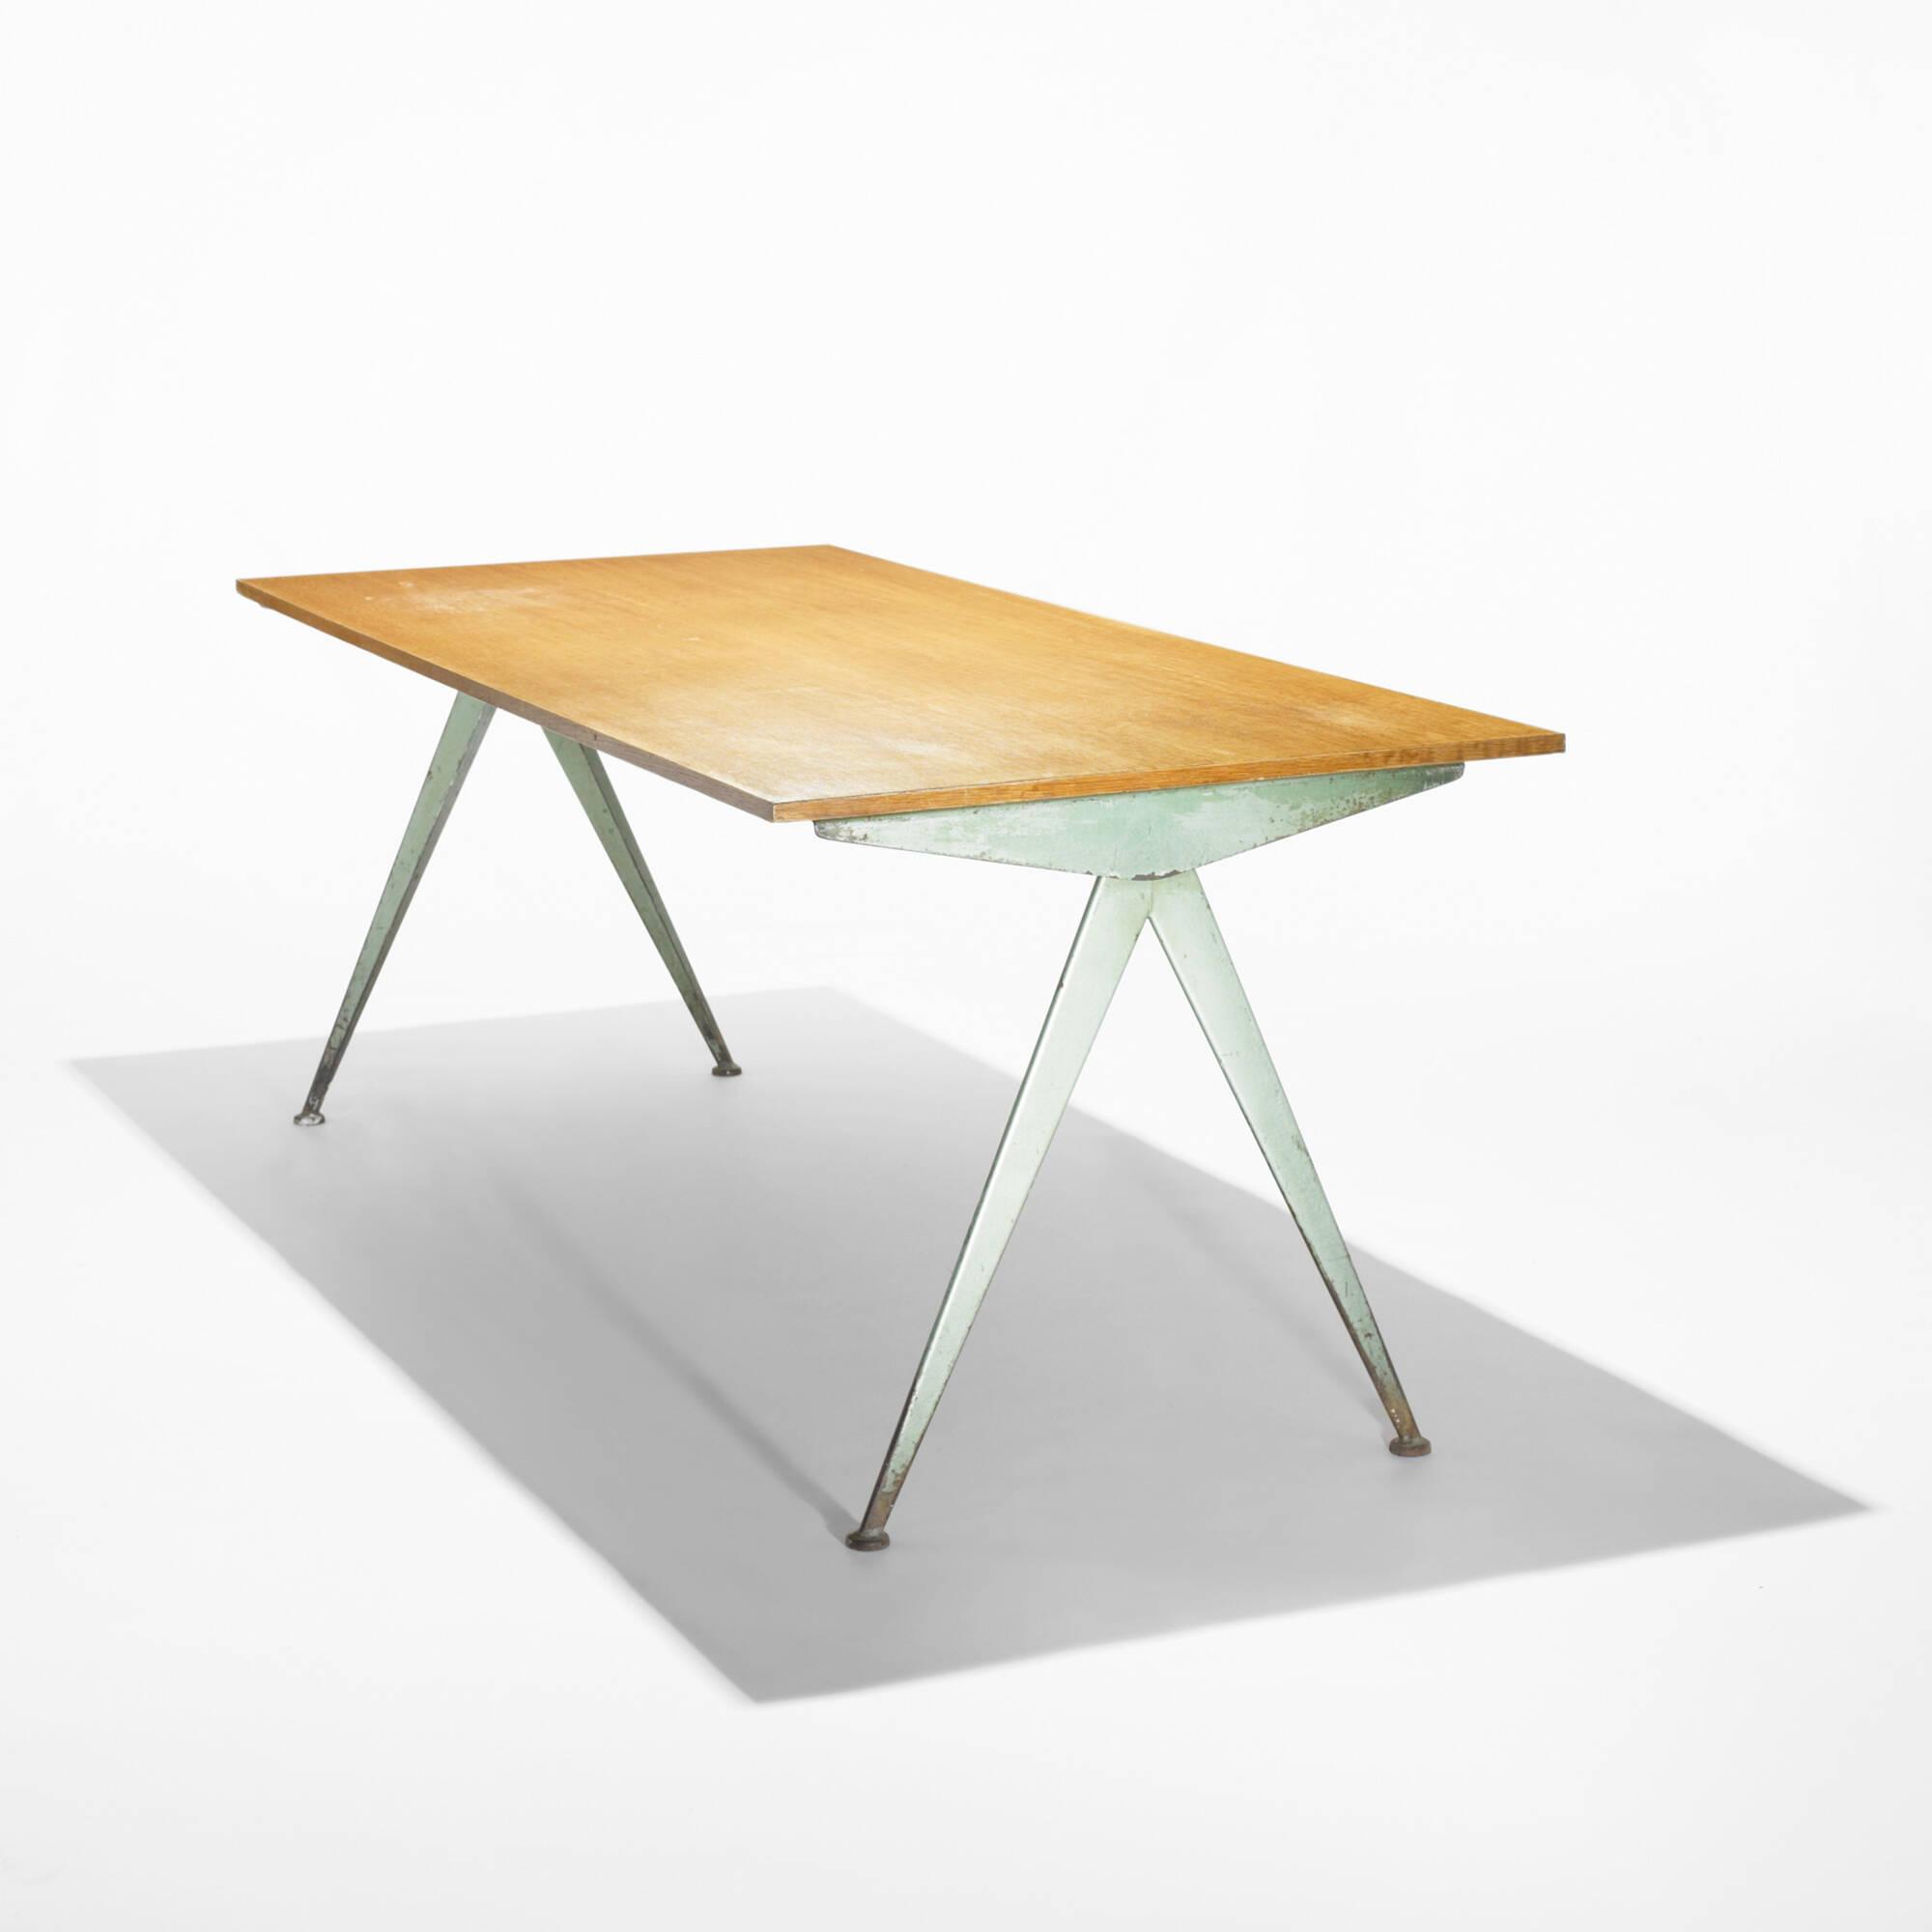 193: JEAN PROUVÉ, Compass Table U003c Important Design, 2 June 2009 U003c Auctions  | Wright: Auctions Of Art And Design